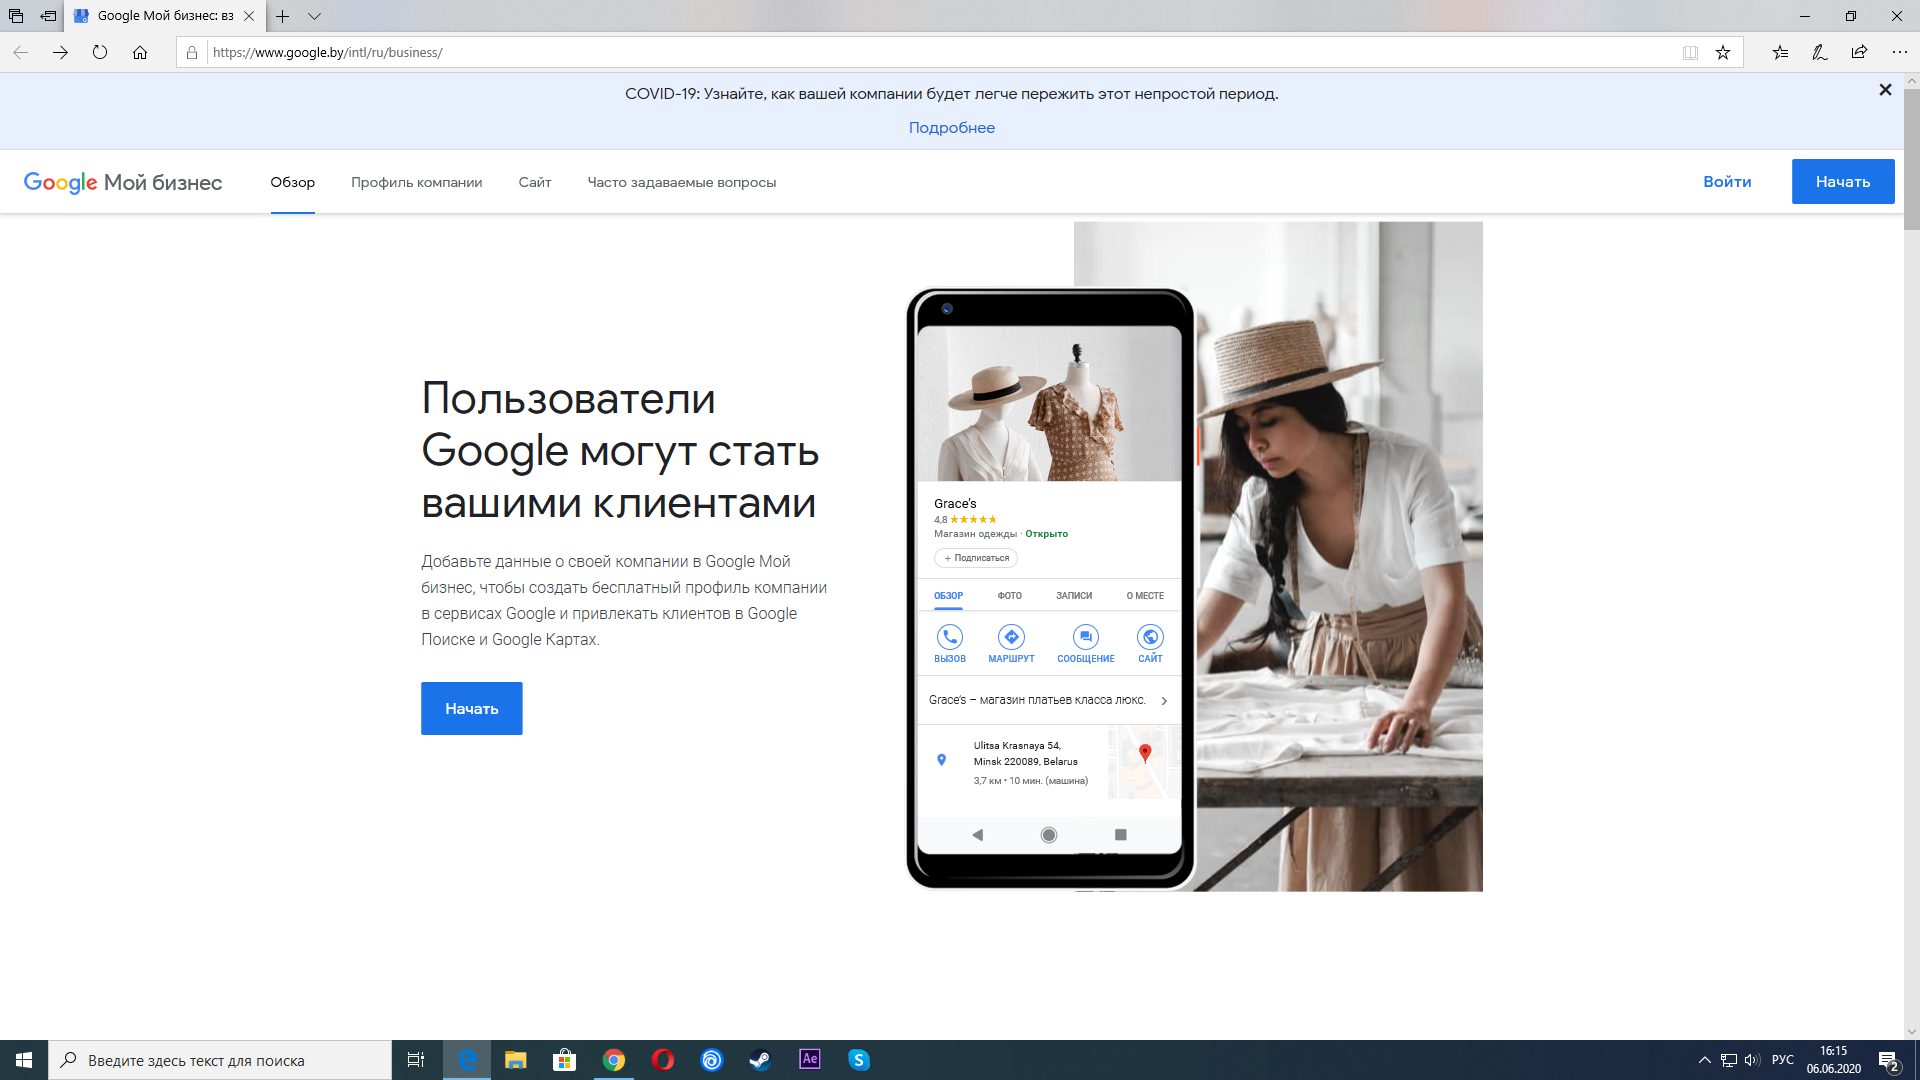 Гугл мой бизнес - авторизация